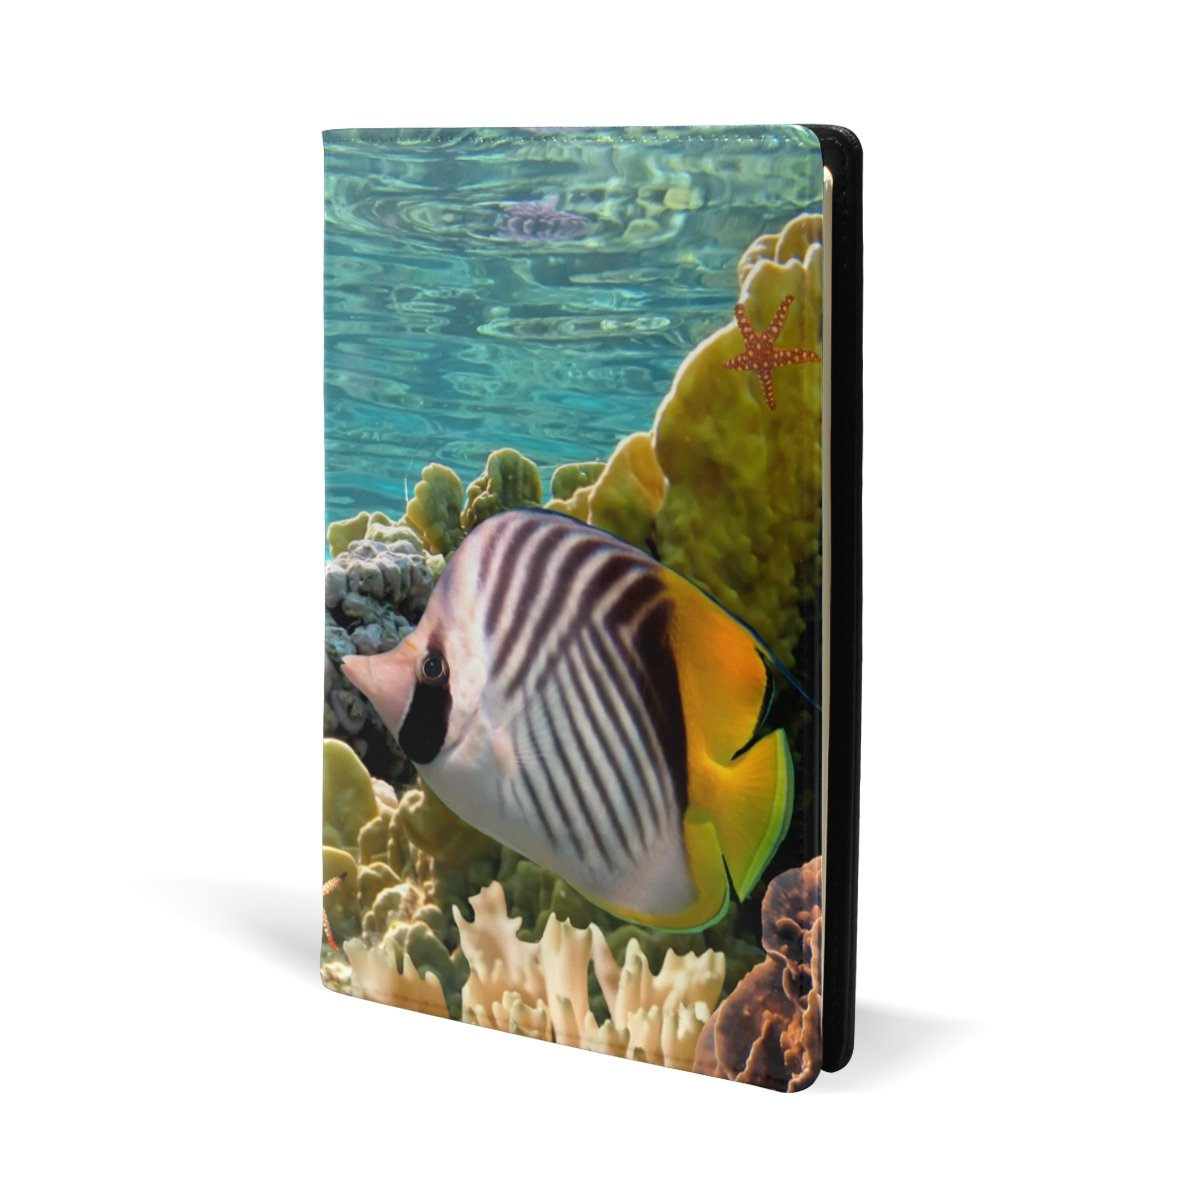 aideessカラフルCoral Reef Sea Turtle魚Stretchable Book cover-fits教科書最もハードカバーUp To 8.7 X 5.8 in粘着フリー、レザーファブリックSchool Bookプロテクター、簡単にPut Onジャケット   B075132QRQ